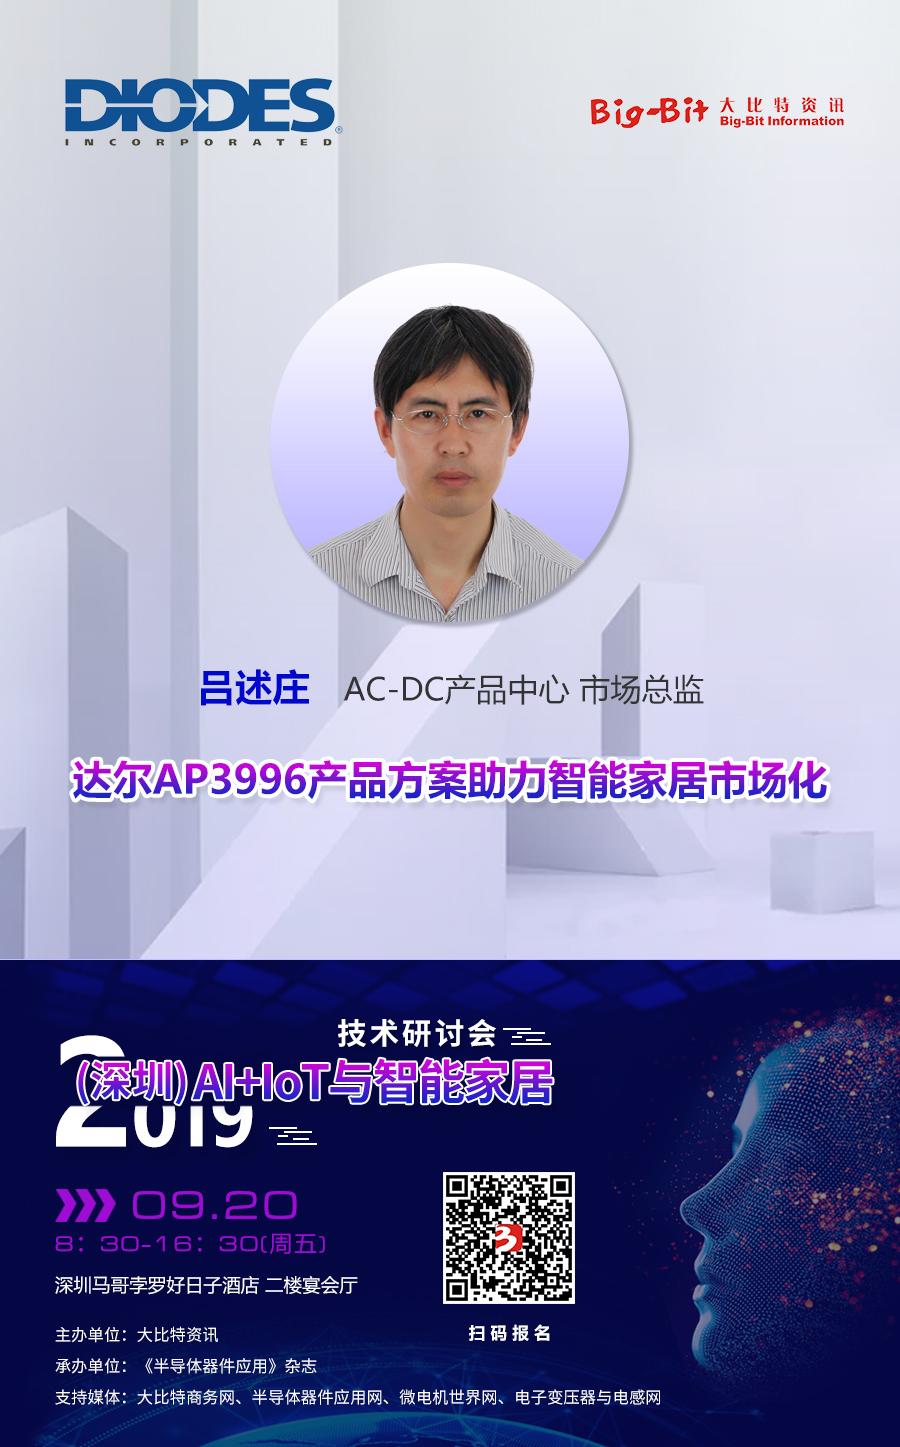 "Diodes公司AC-DC产品市场总监吕述庄将出席""2019'(深圳)AI+IoT与智能家居技术研讨会"""